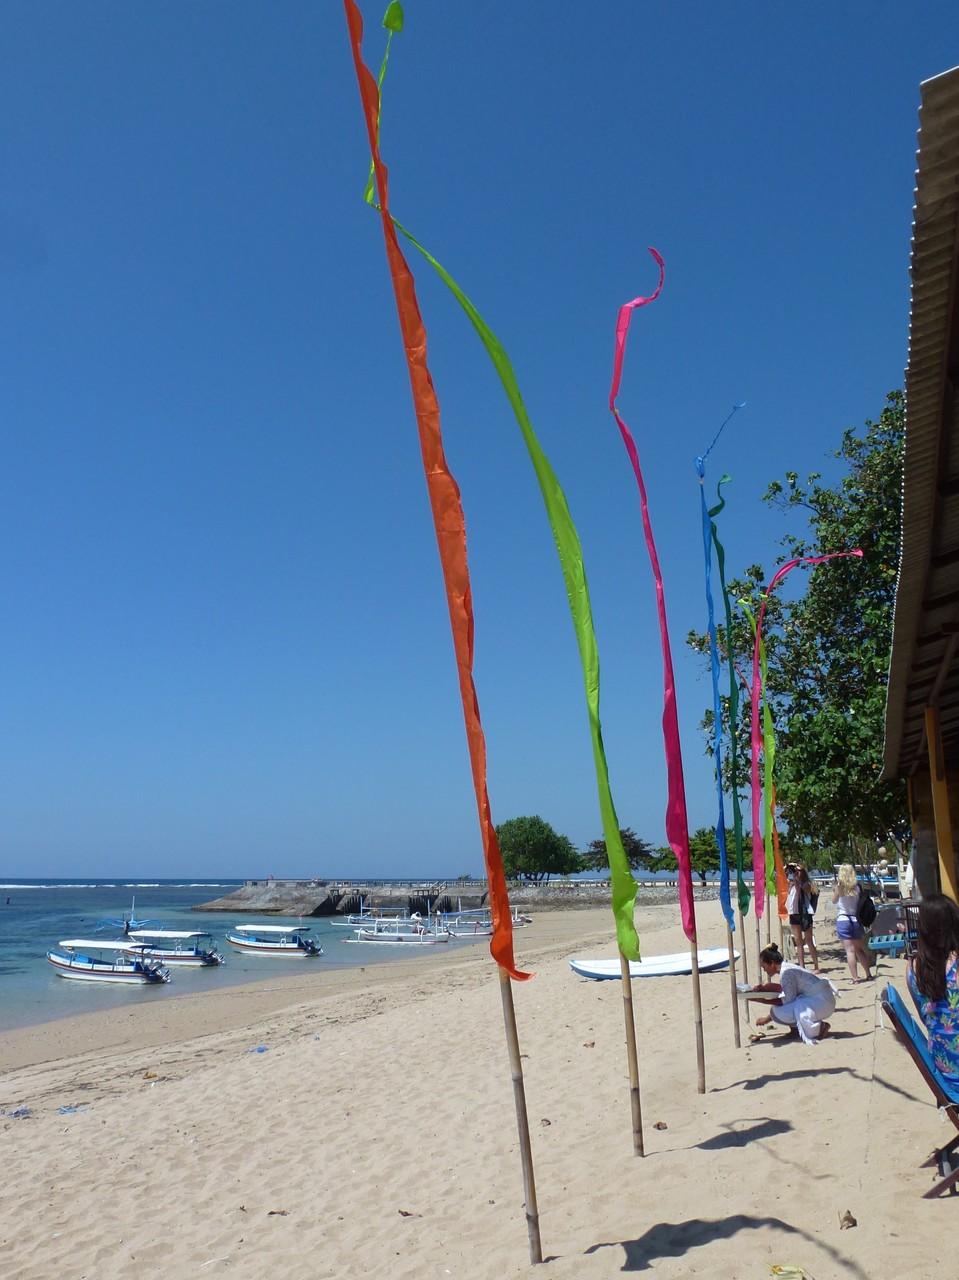 Bild: Bali-Fahnen - Foto 1